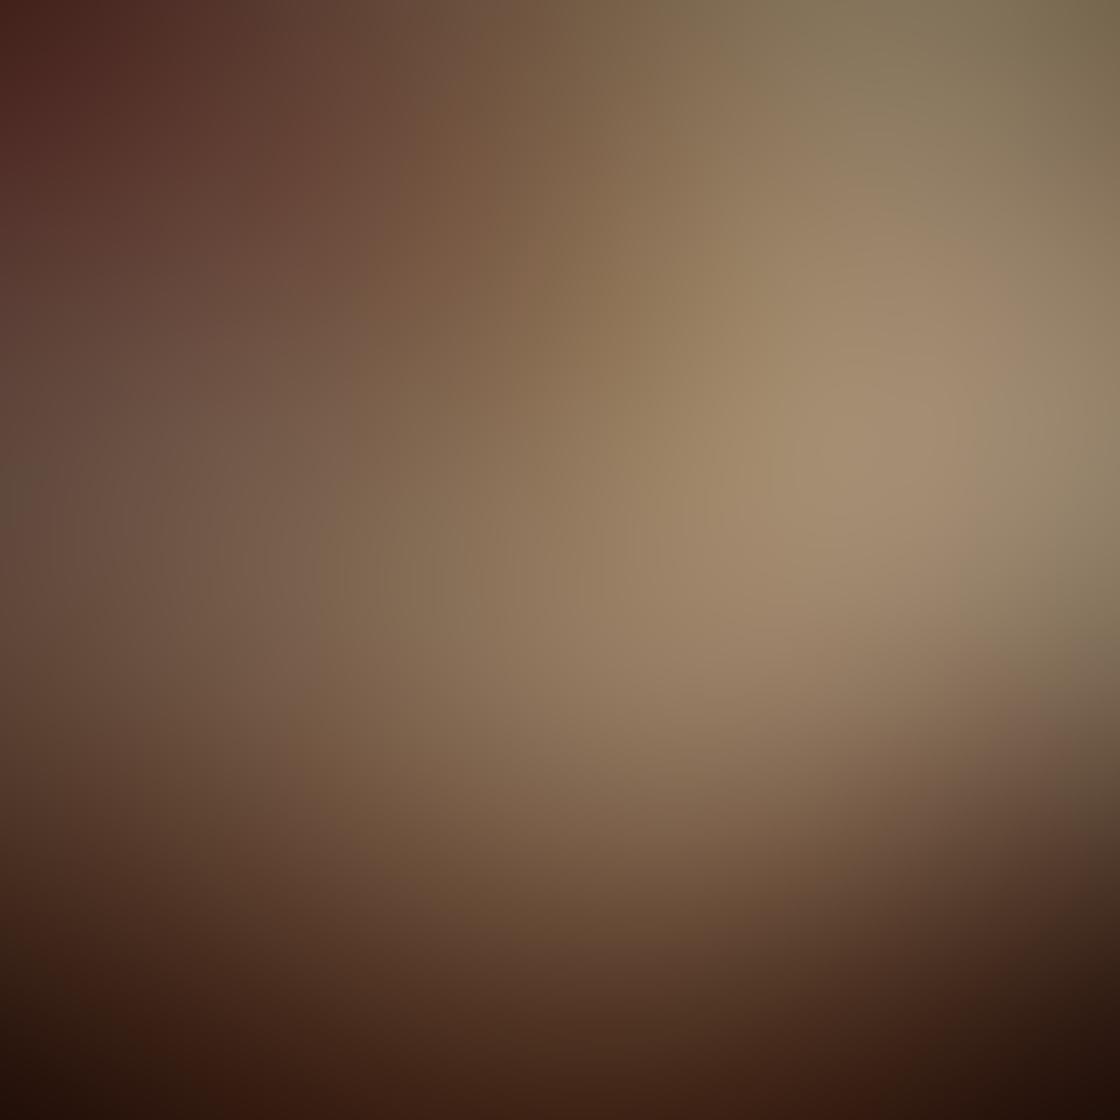 Kelly Tan iPhone Photos 14